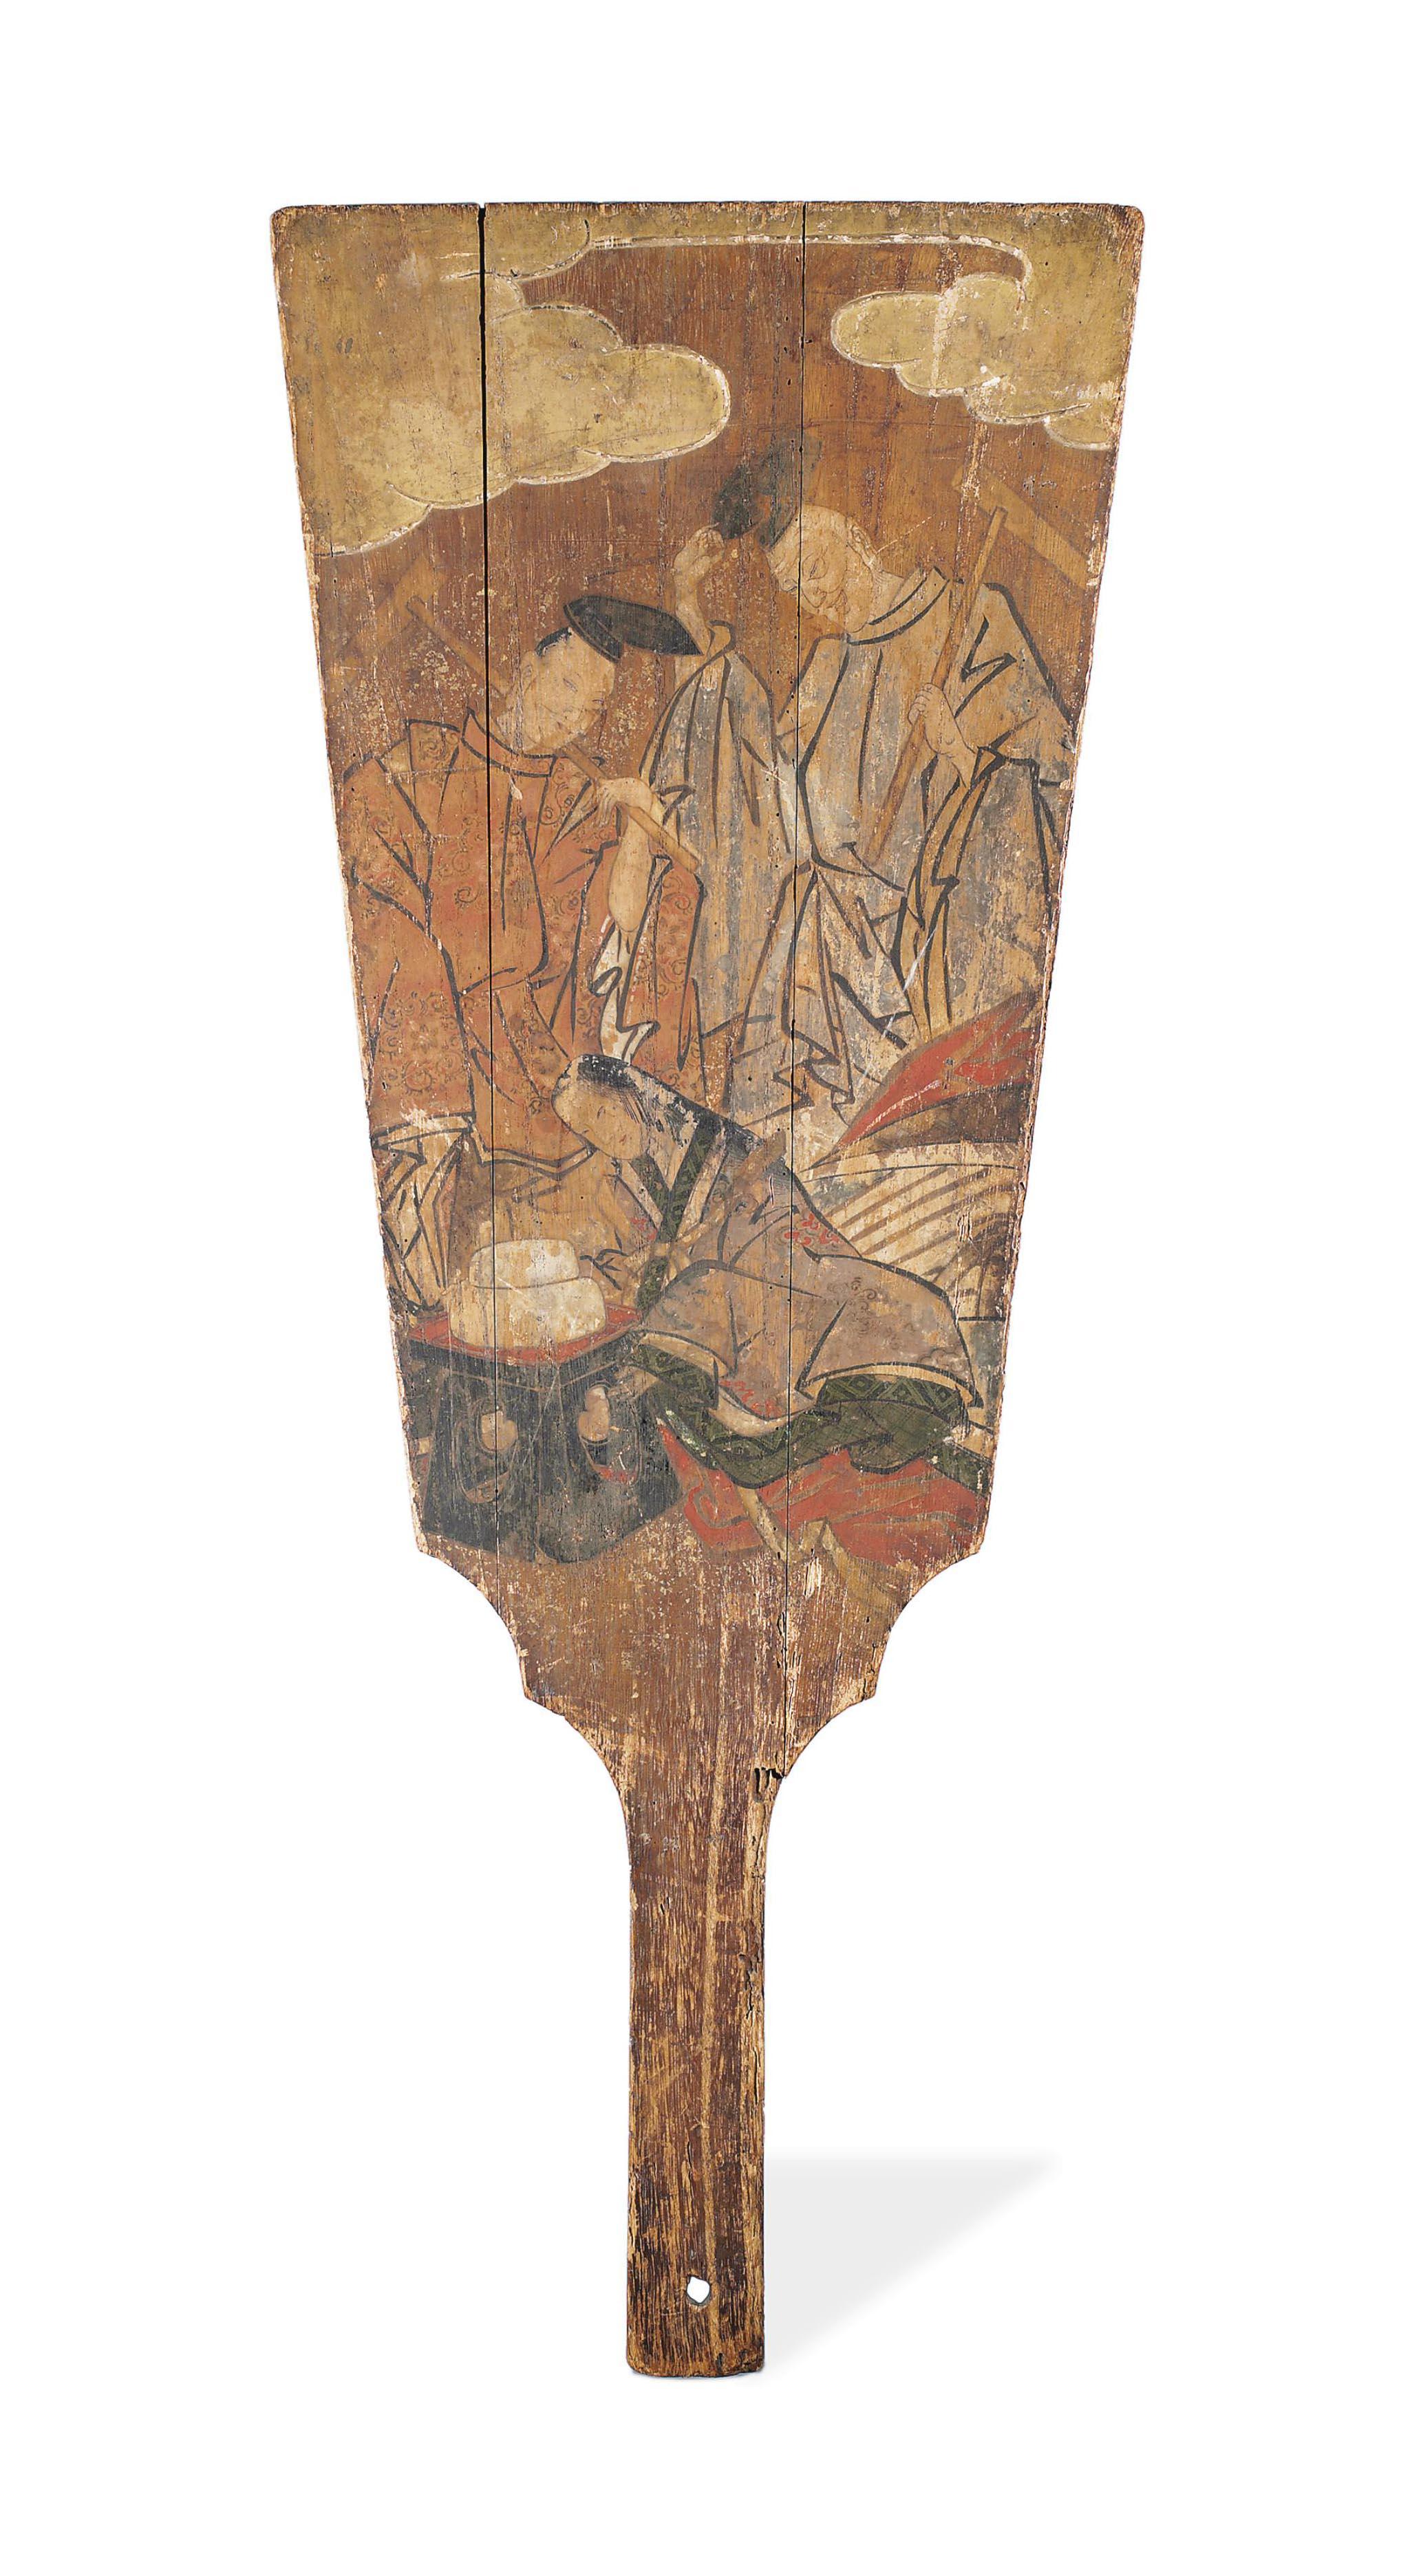 A Wood Hagoita [Battledore Rac